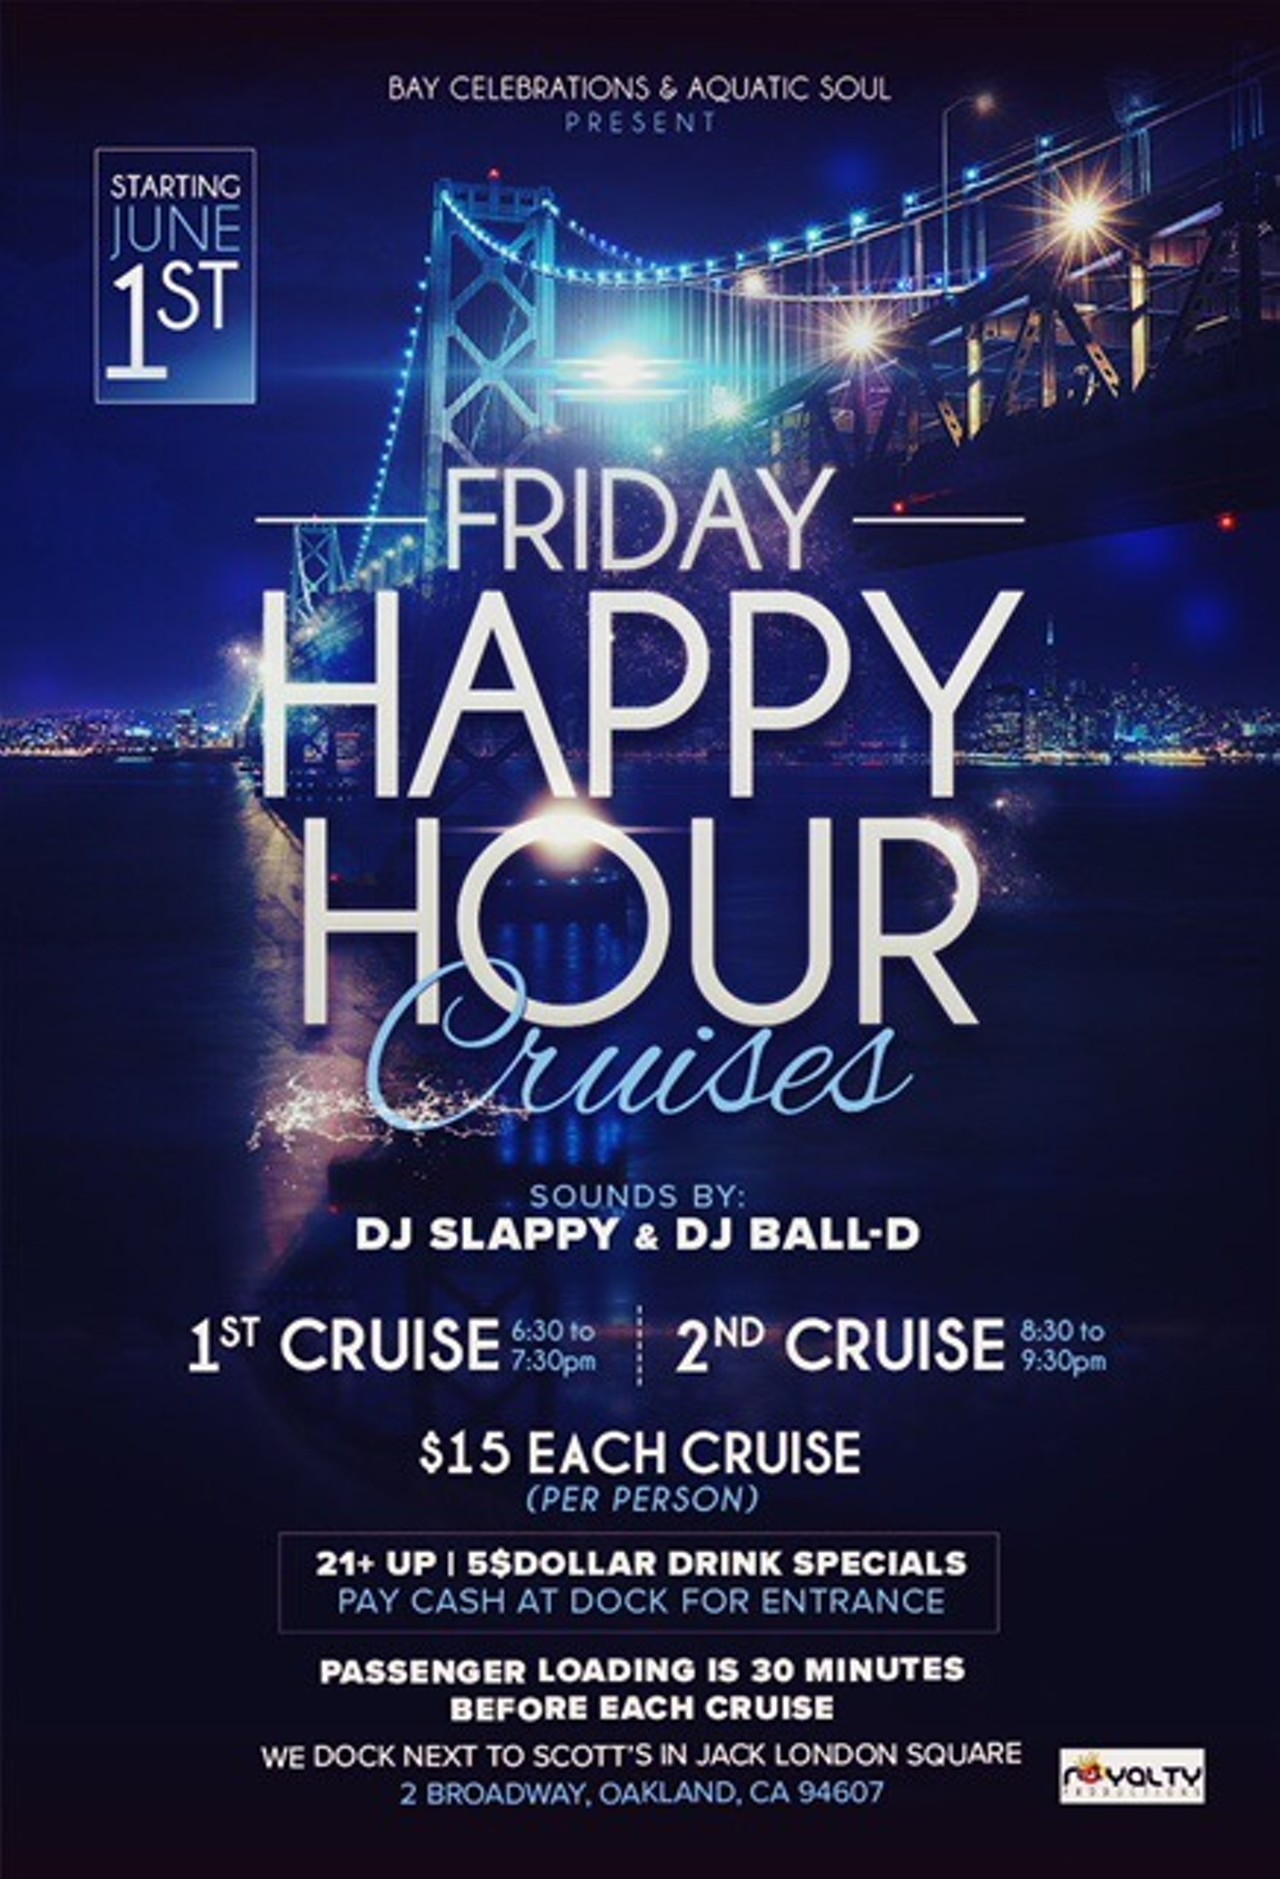 Friday Happy Hour Cruises Jack London Square 2 Broadway